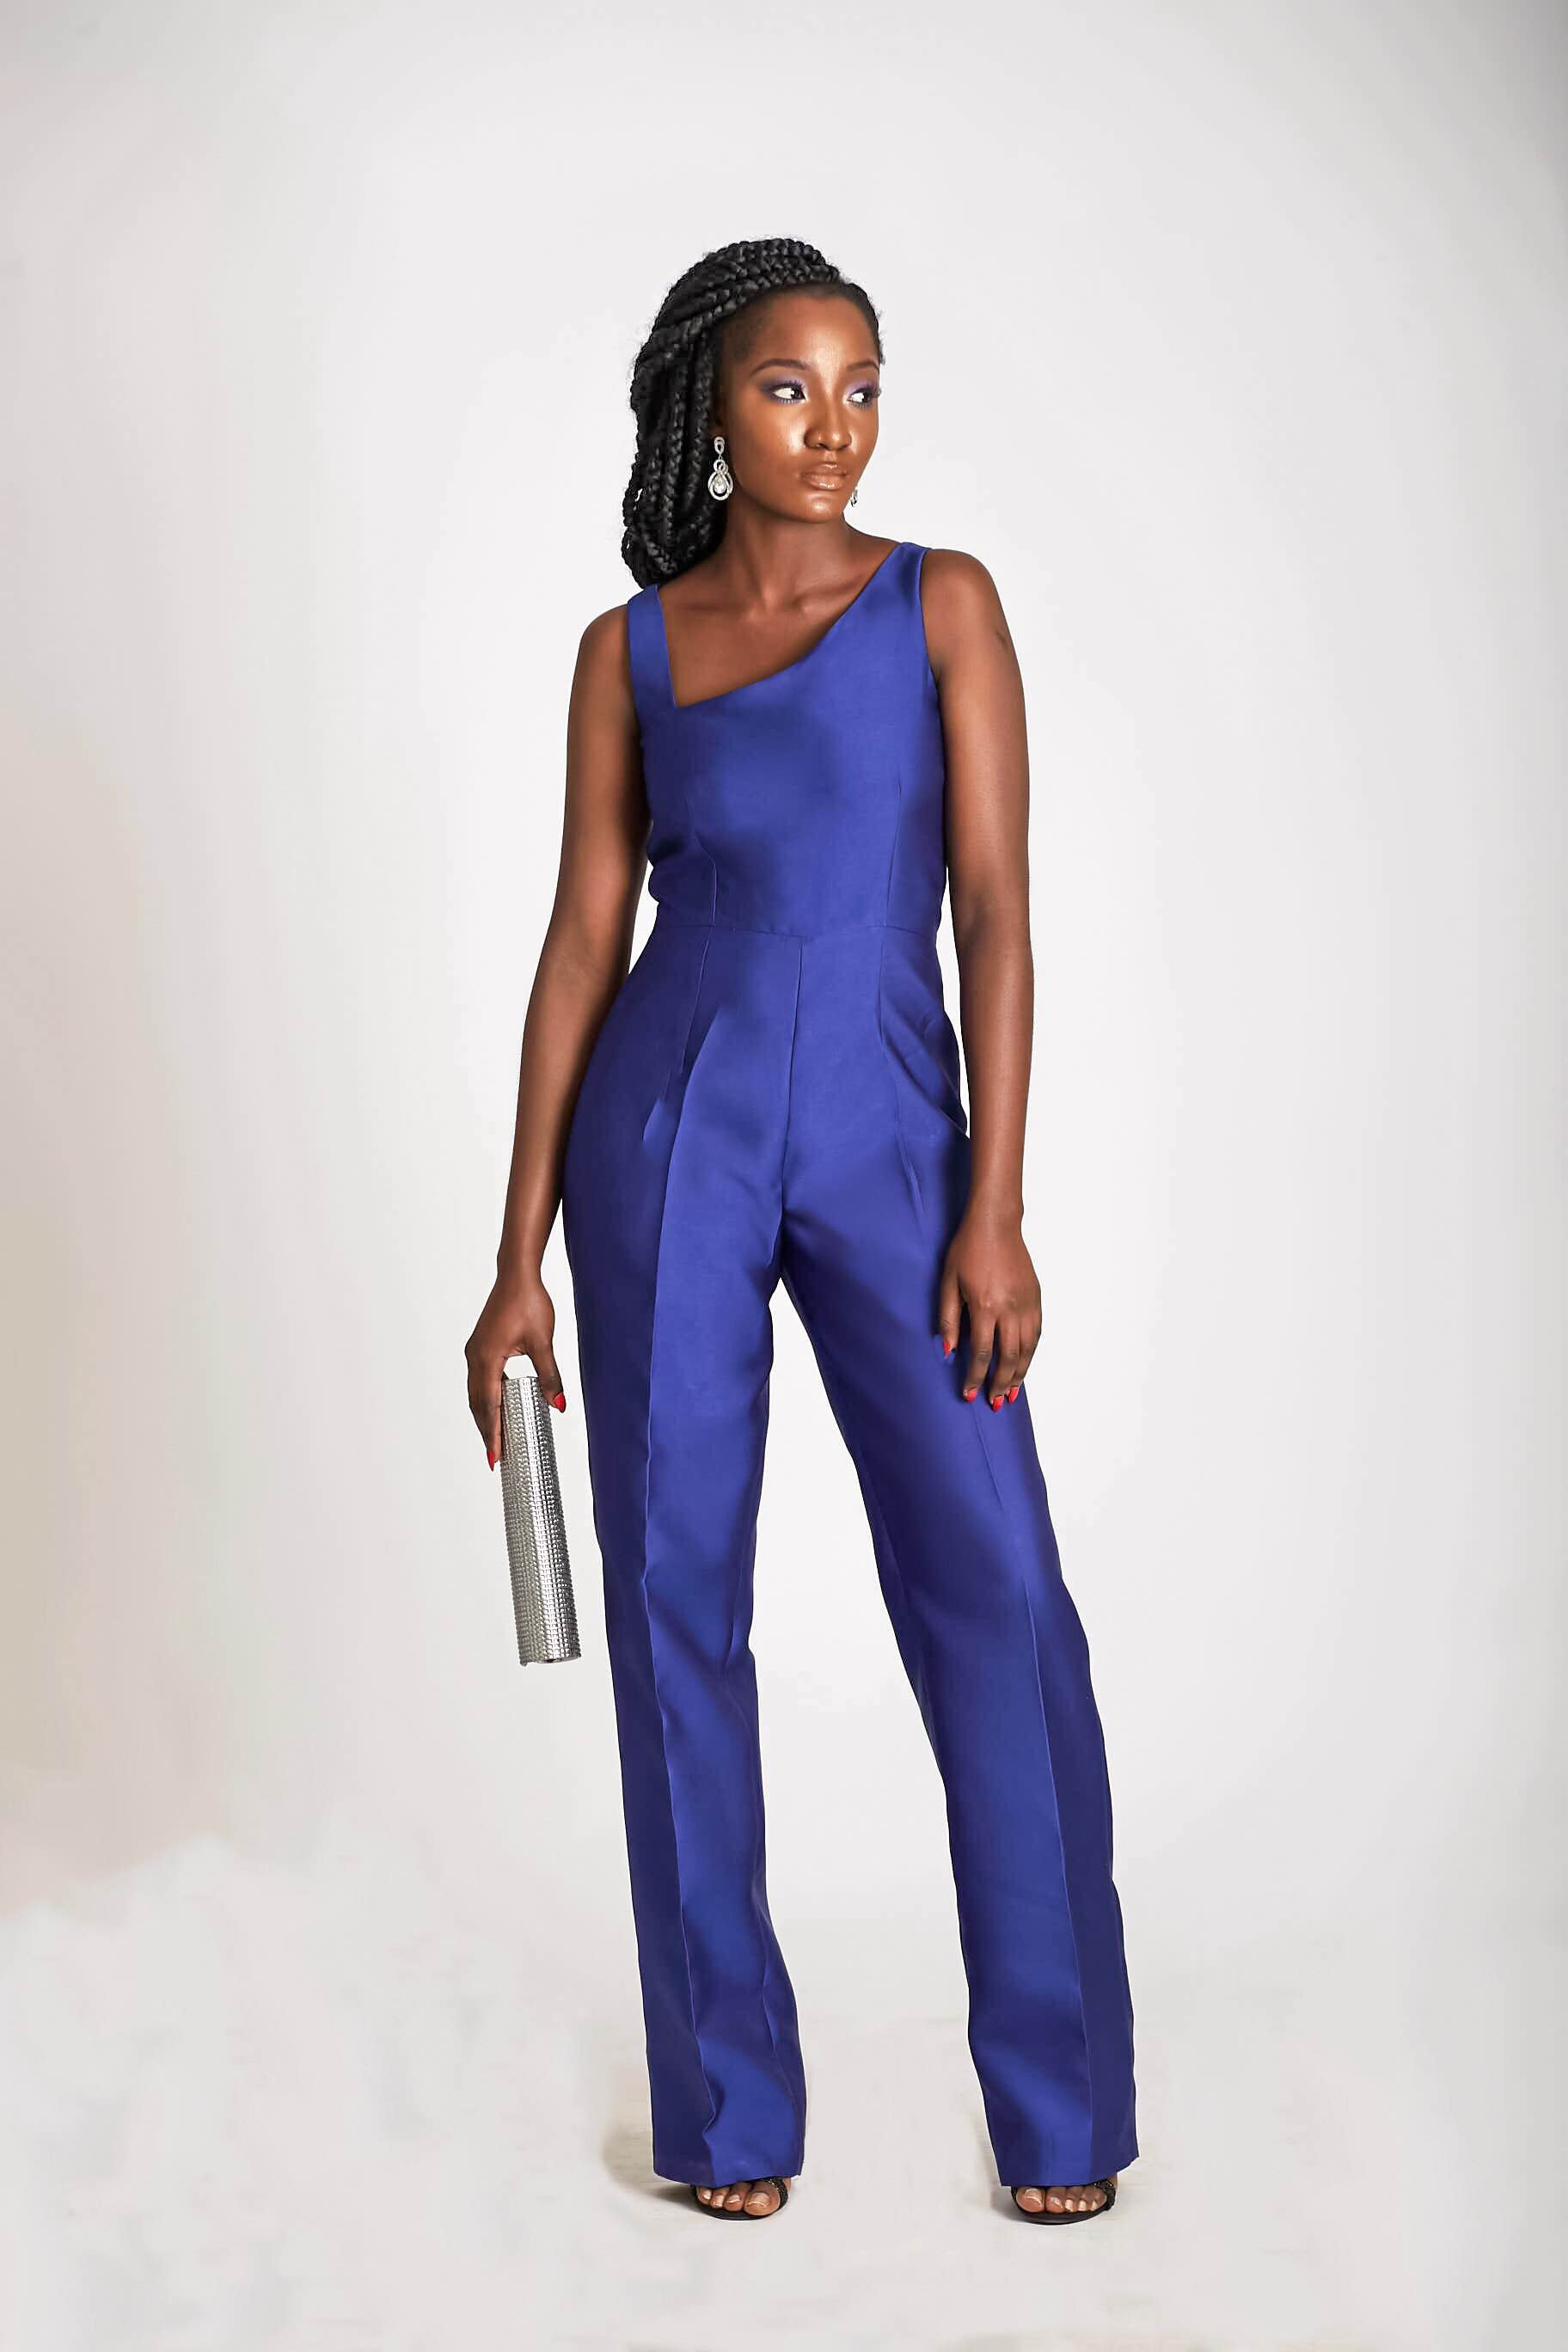 Imad Eduso - BN Style - Collection Lookbook - BellaNaija.com 018